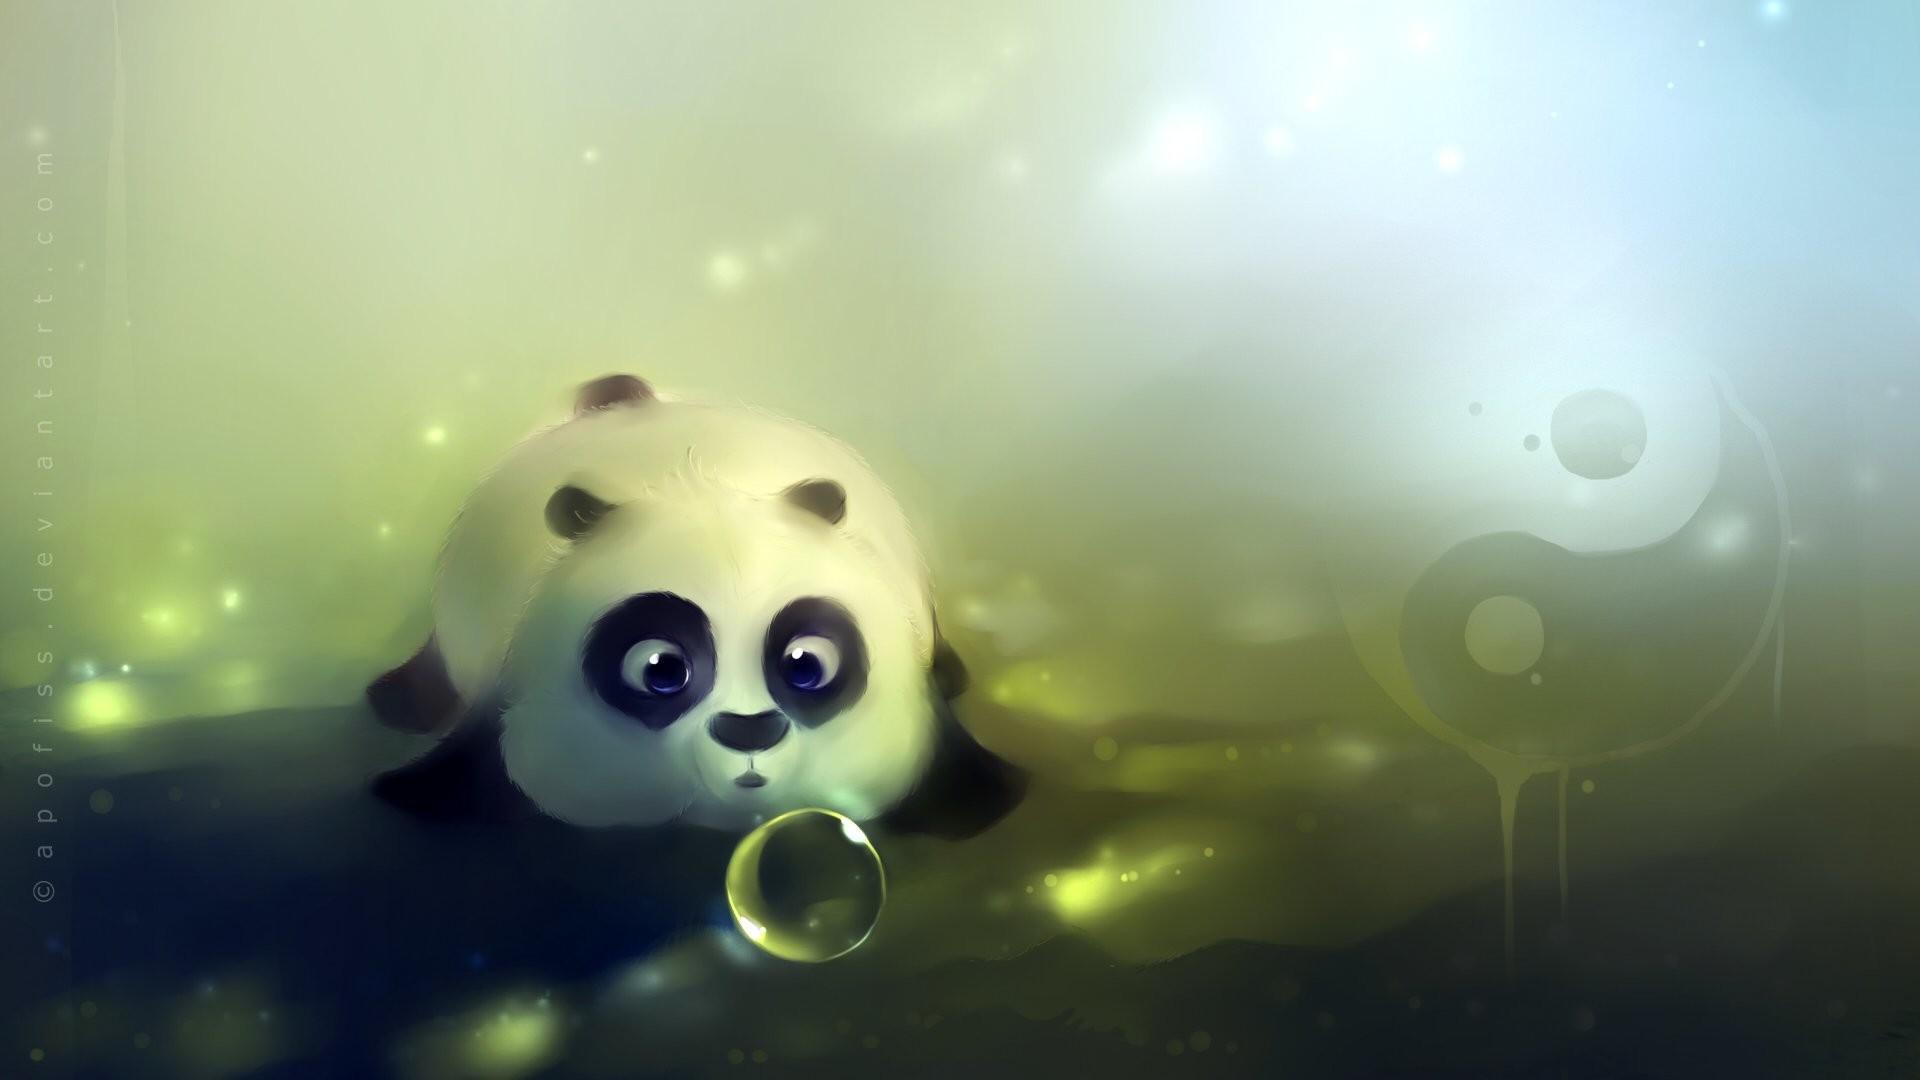 Res: 1920x1080, HD Wallpaper   Background Image ID:145977.  Animal Panda